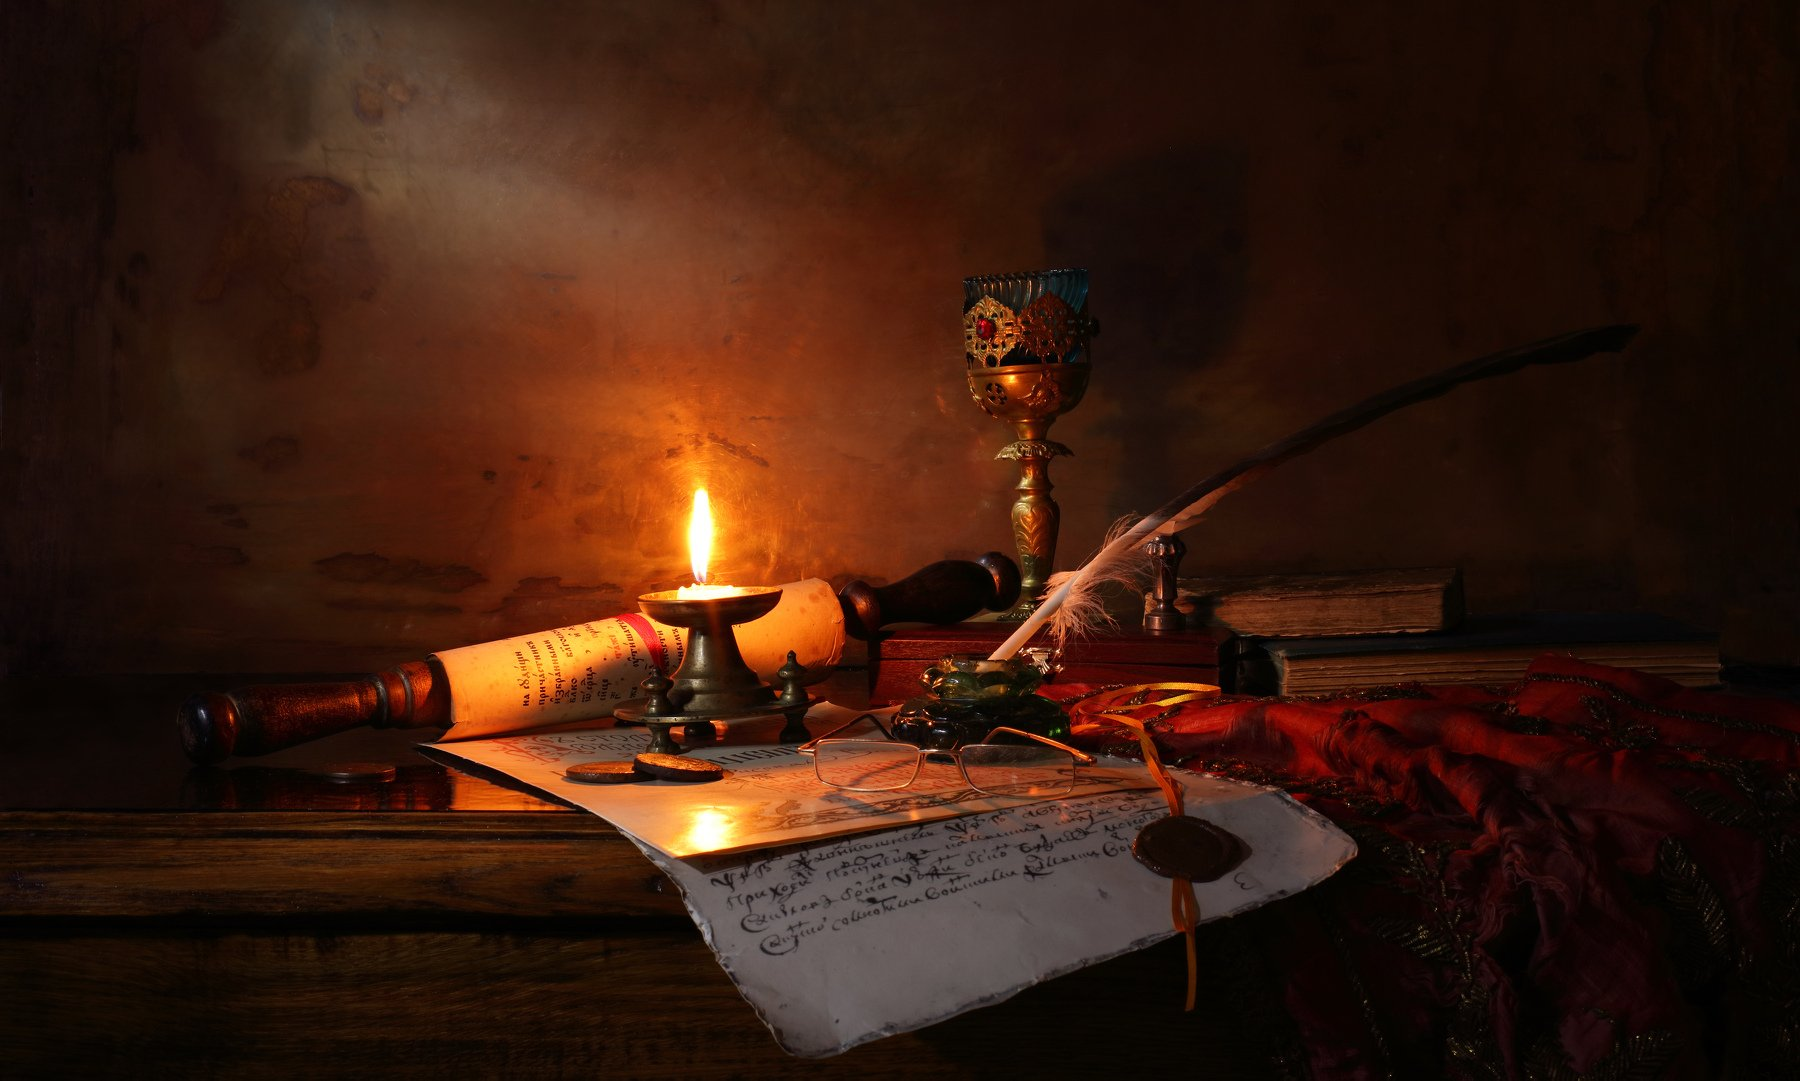 свиток, свеча, история, книги, Андрей Морозов